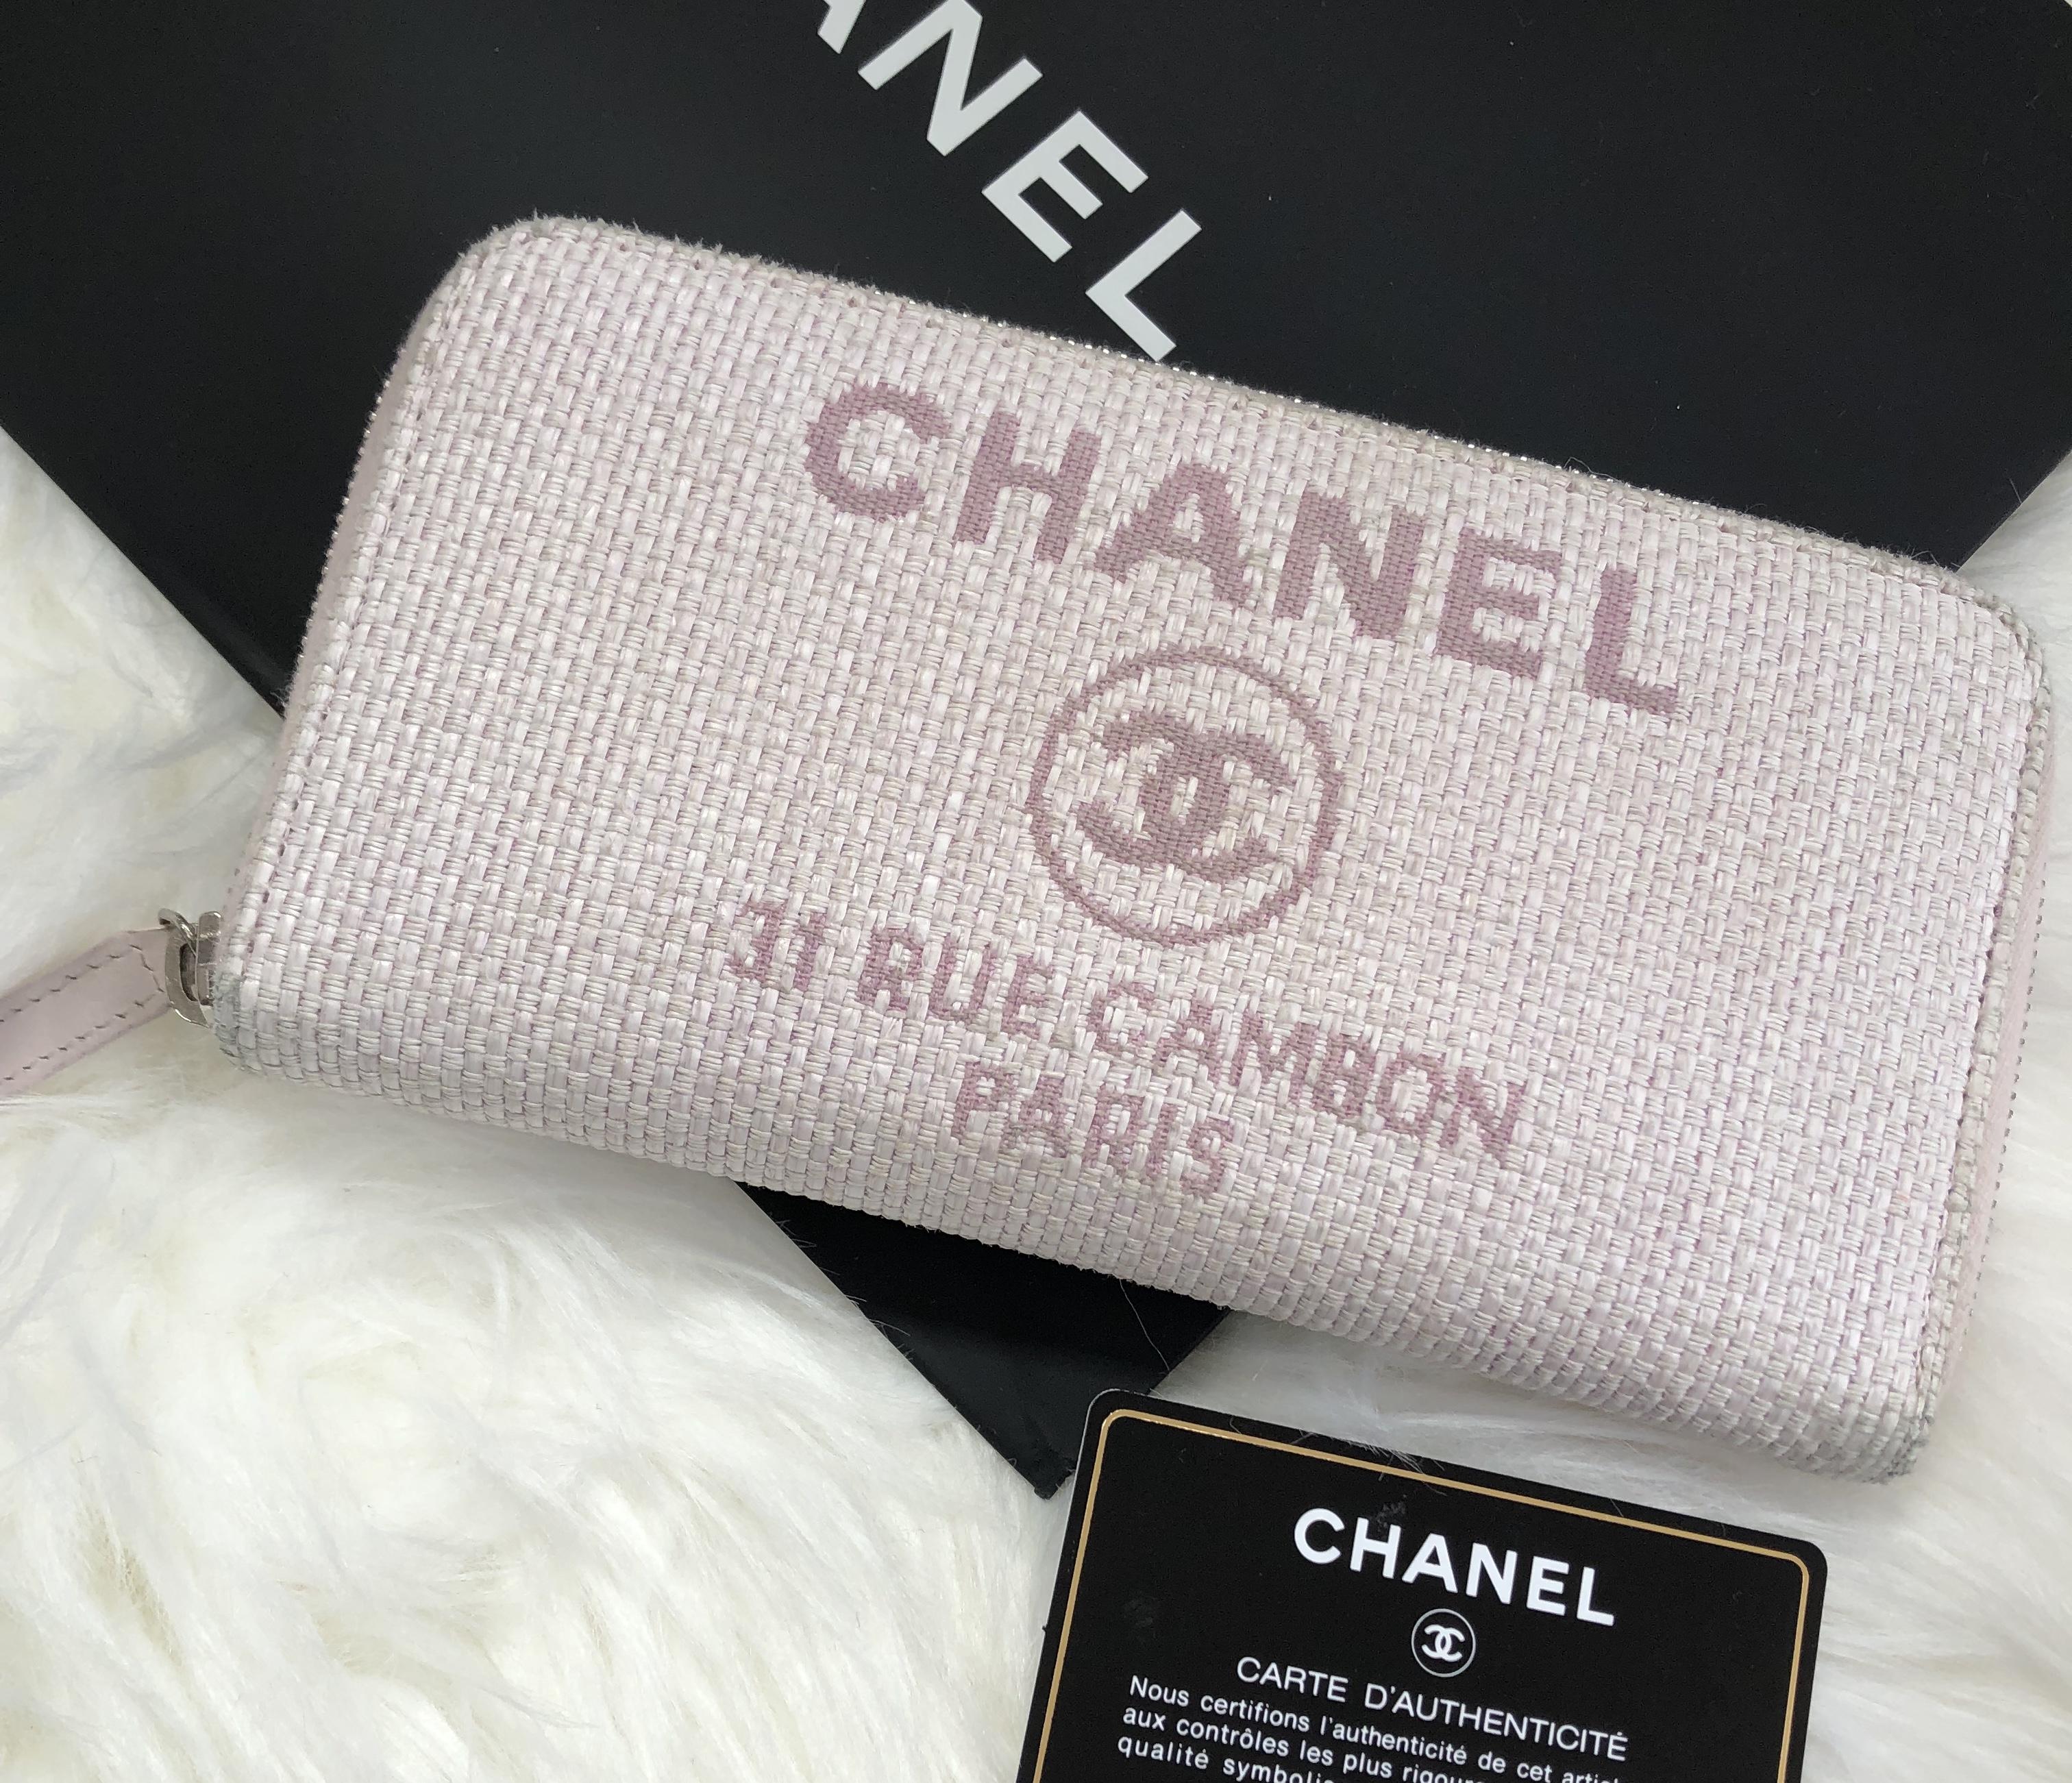 CHANELシャネルの人気ライン・ドーヴィルが入荷♡カジュアルだけど上品♫シャネル財布販売♥︎